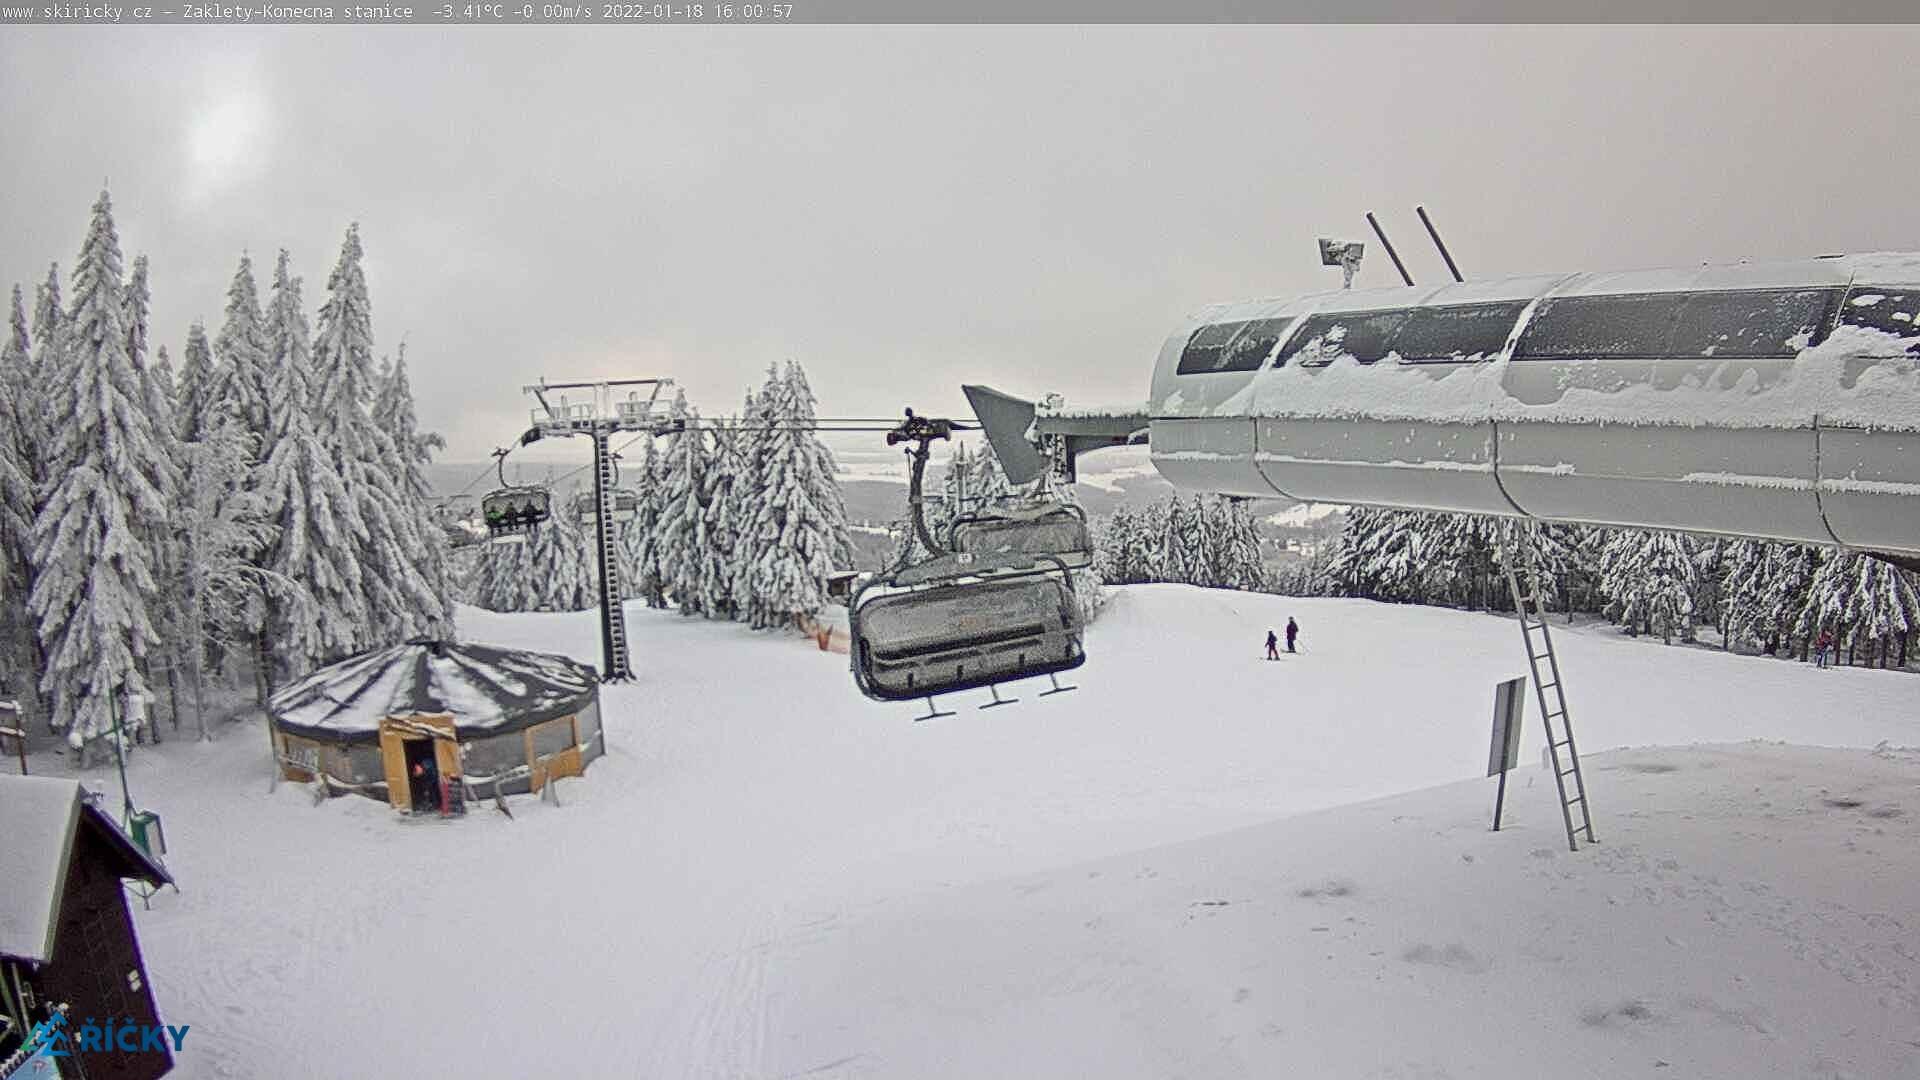 Webcam Ski Resort Ricky v O.h. Ausstieg Sessellift - Eagle Mountains